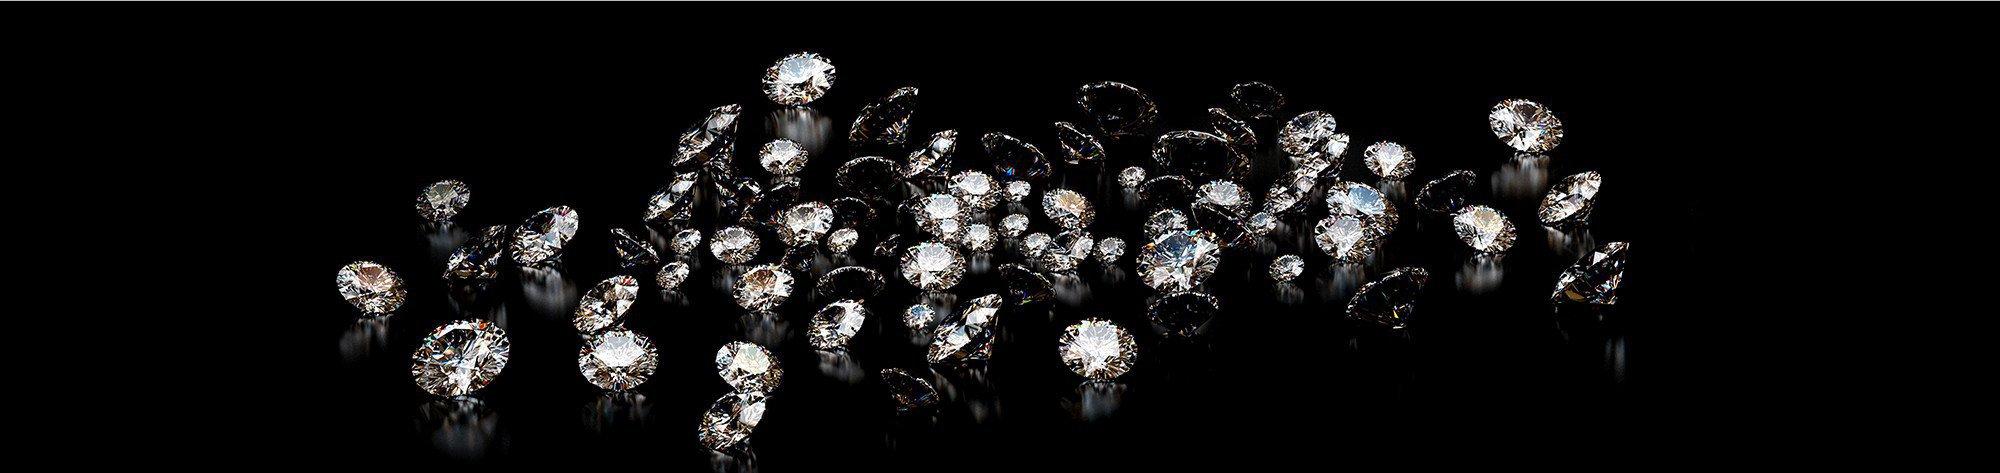 Houston Jewelry Buyer | Houston Jewelry Store | Diamond